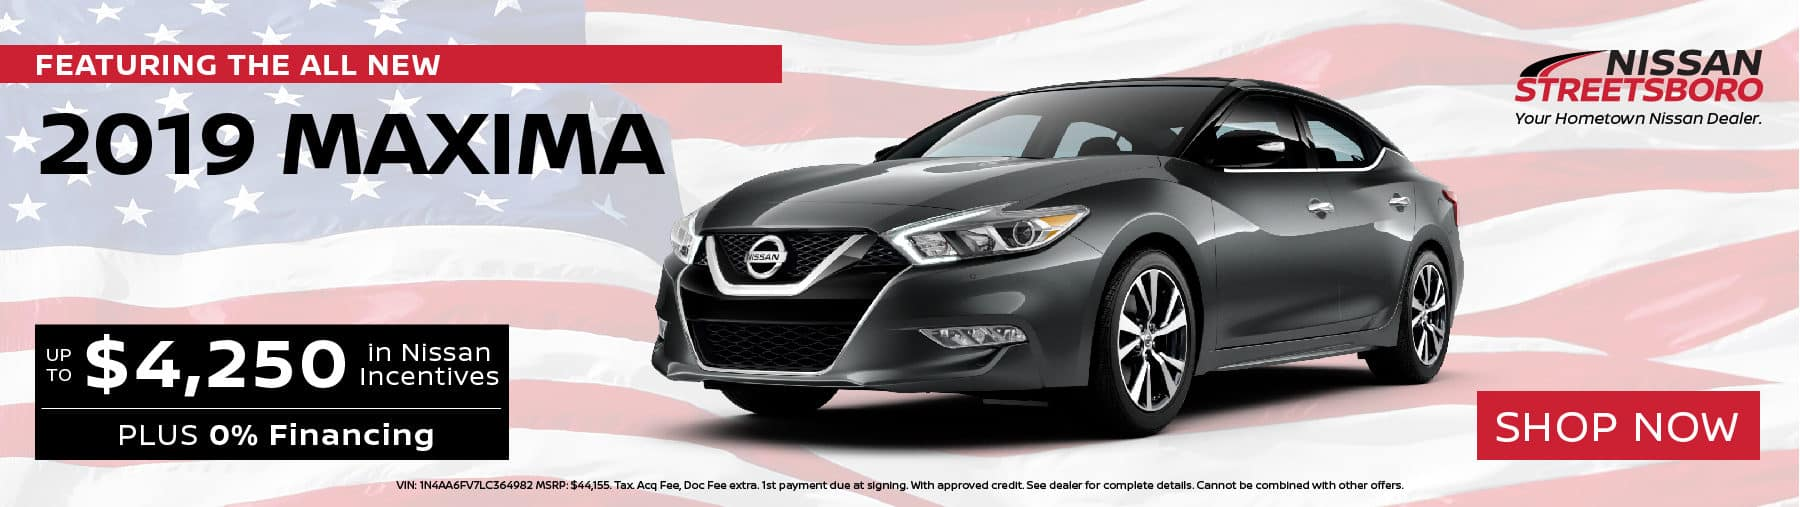 2019 Nissan Maxima Incentives